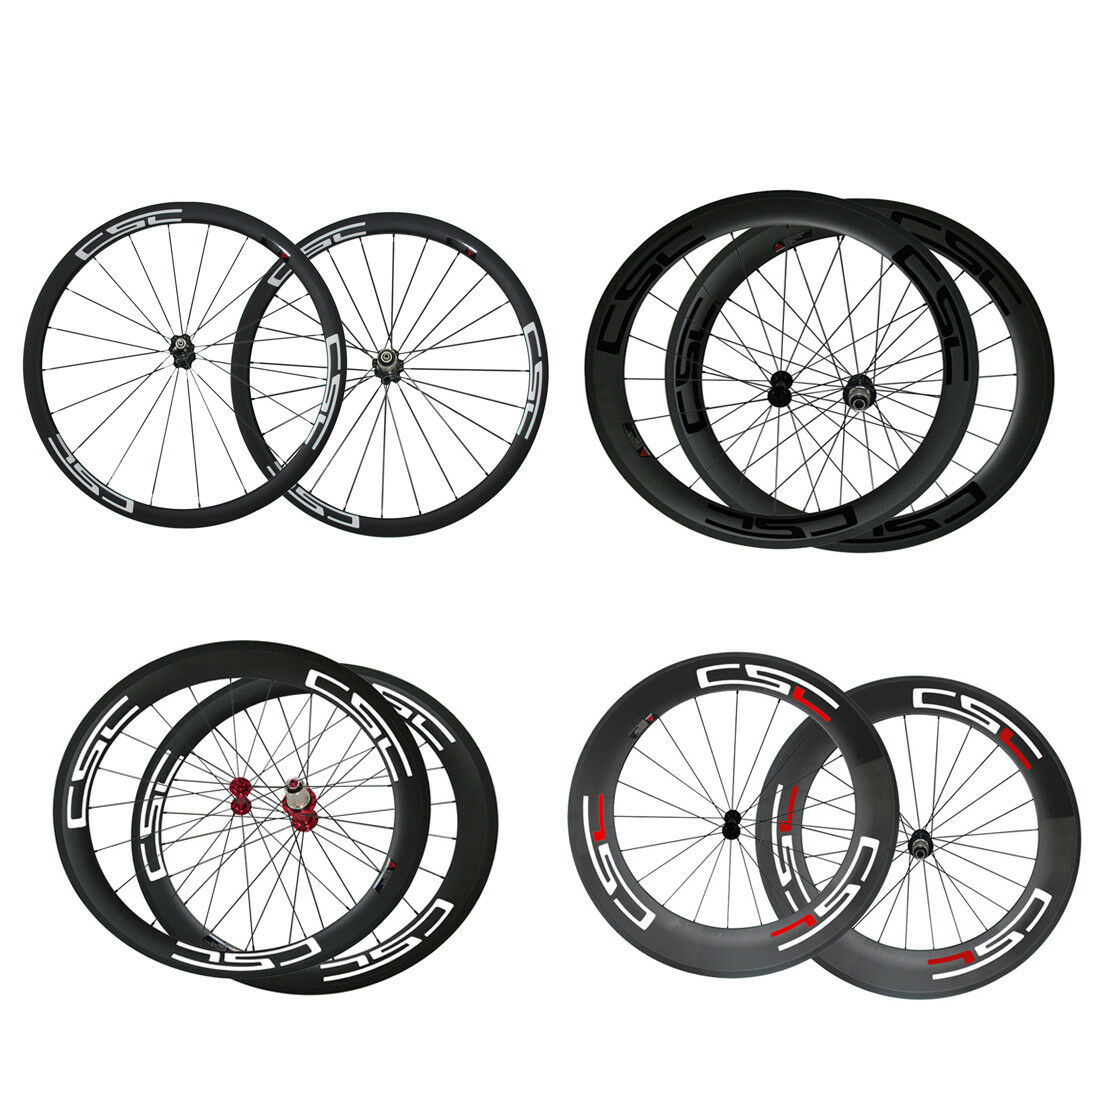 Factory 24 38 50 60 88mm Clincher Tubular Road Race Carbon Wheelset Wheels 700C